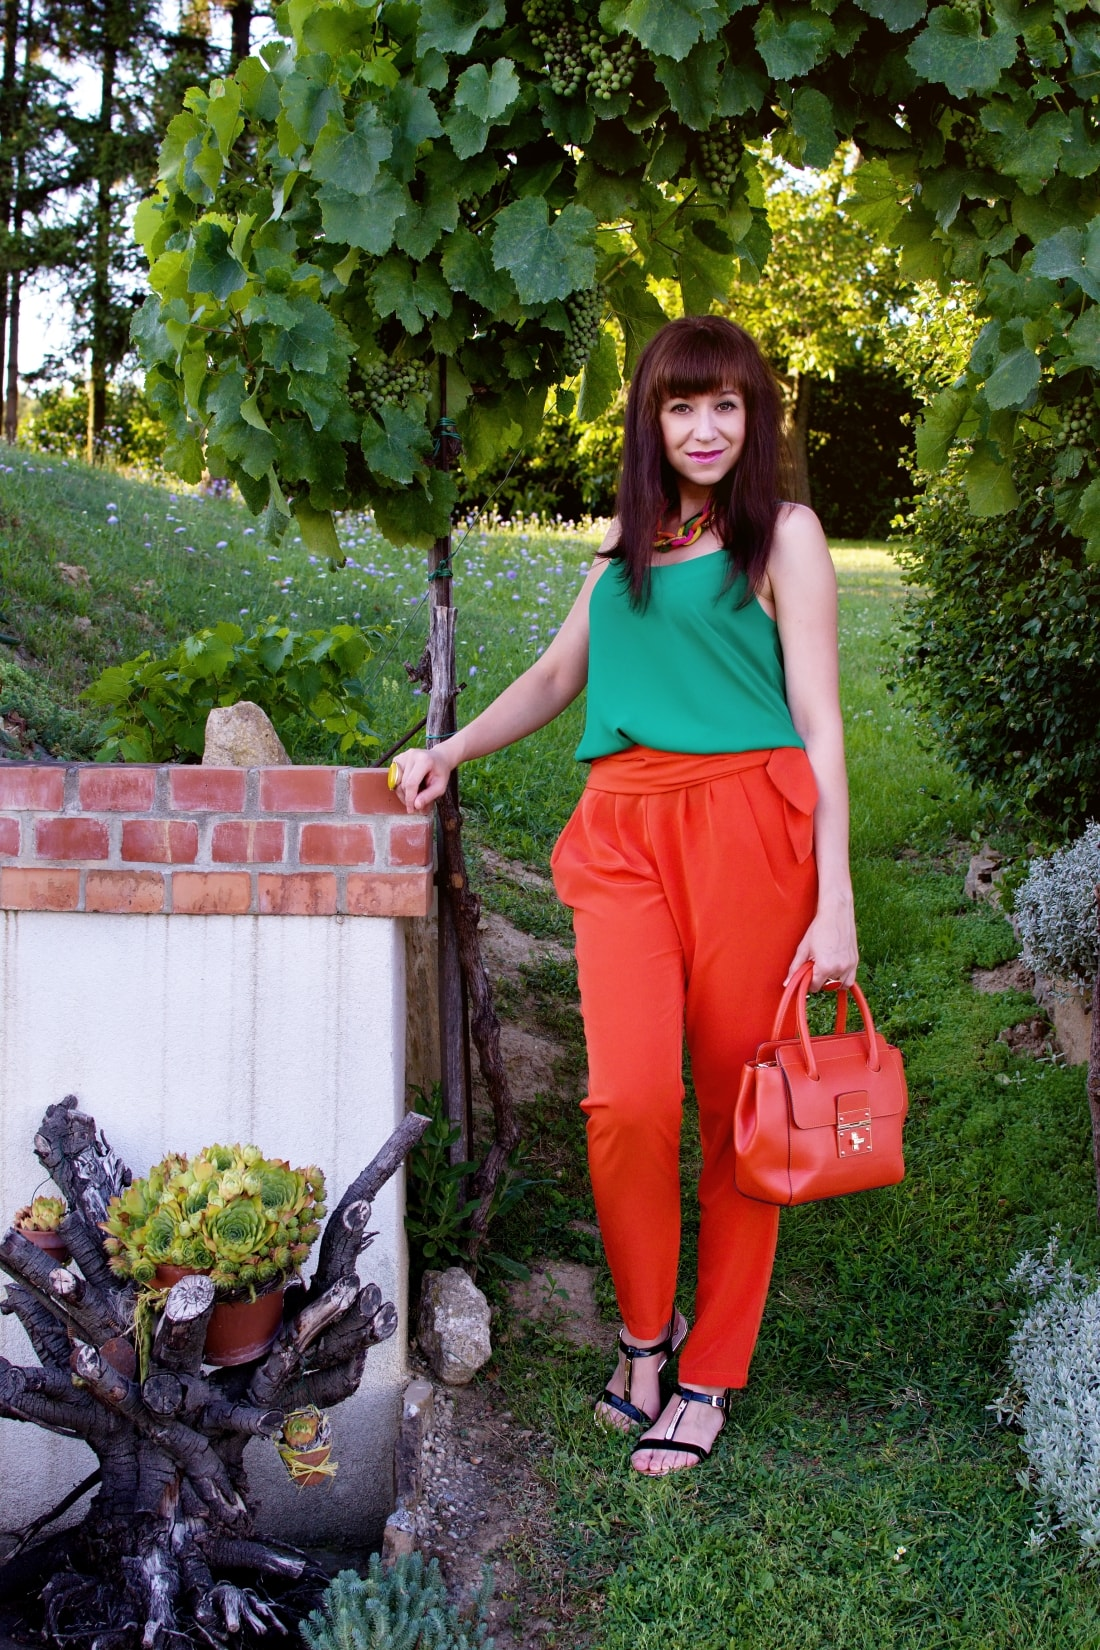 katharine-fashion-is-beautiful-blogger-summer-8